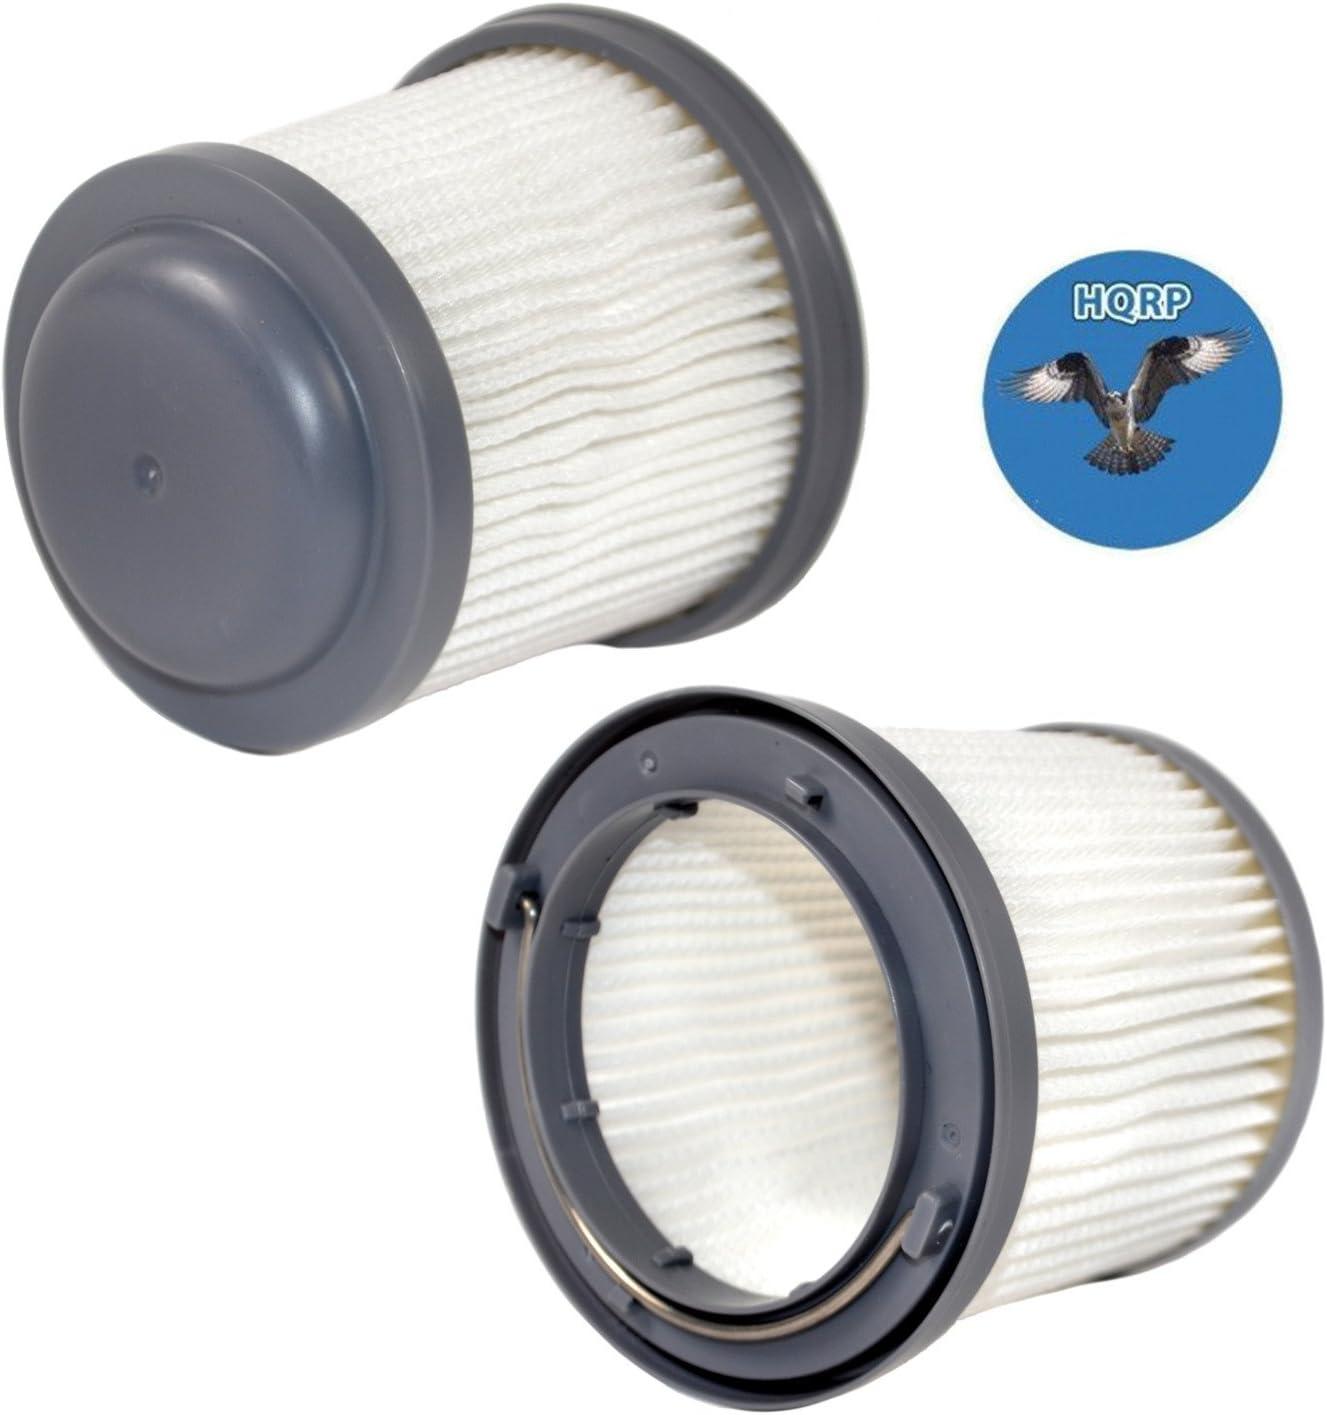 HQRP 2-Pack Washable Filter Works with Black & Decker HFVB320J27, HFVB315J22 DUSTBUSTER, HFVAB320JC26 Car Lithium Flex Hand Vacuum PVF110 Plus Coaster